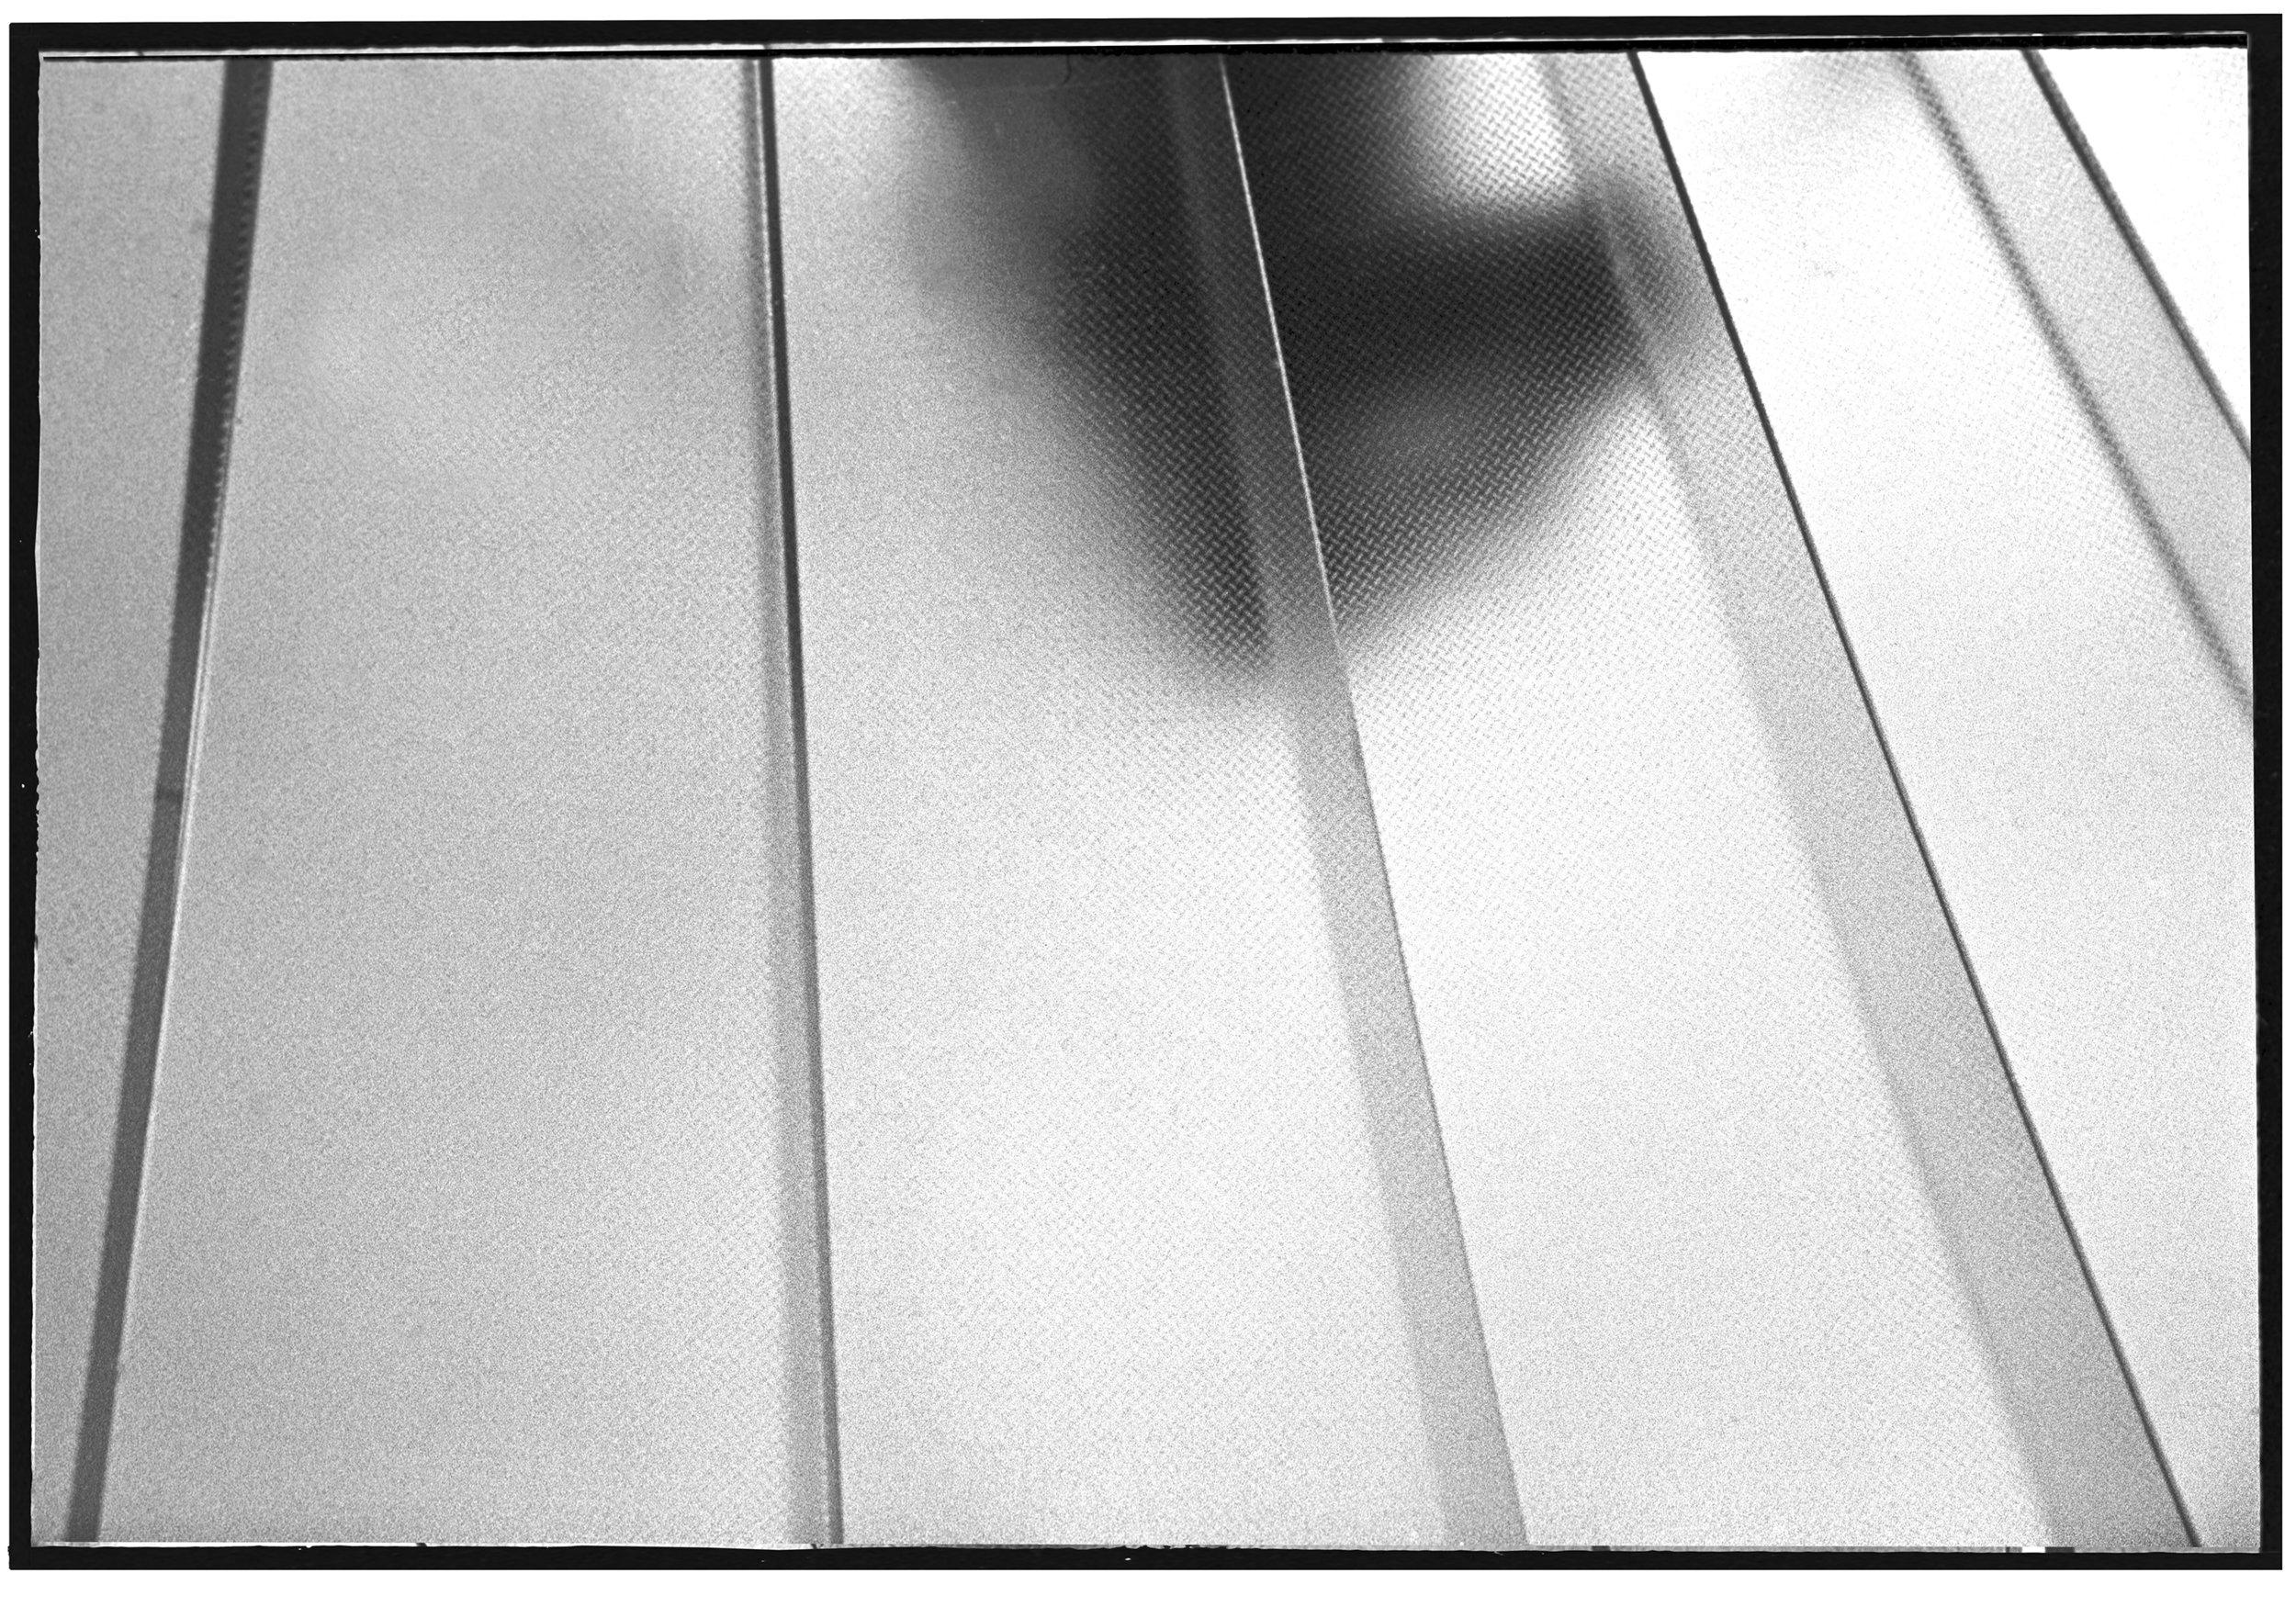 Underfoot_09.jpg